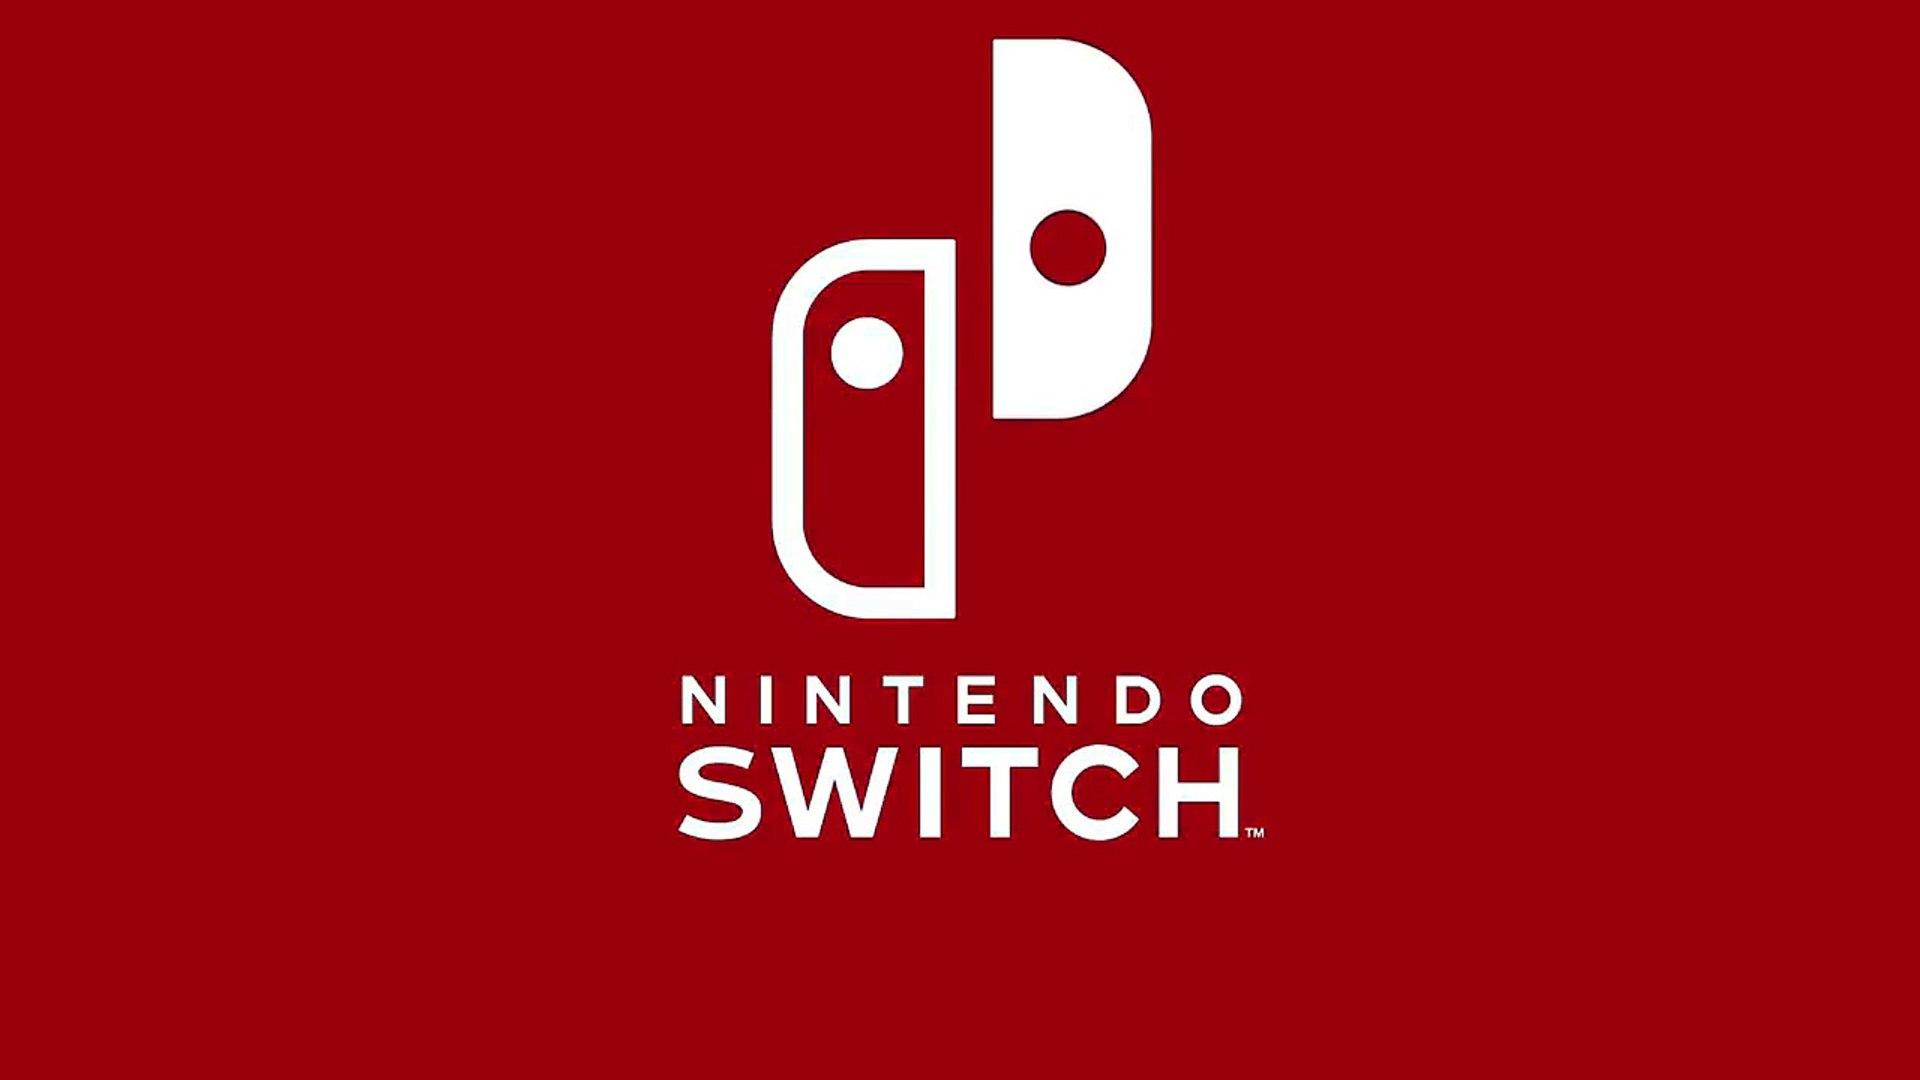 Disc Jam - Nintendo Switch Teaser